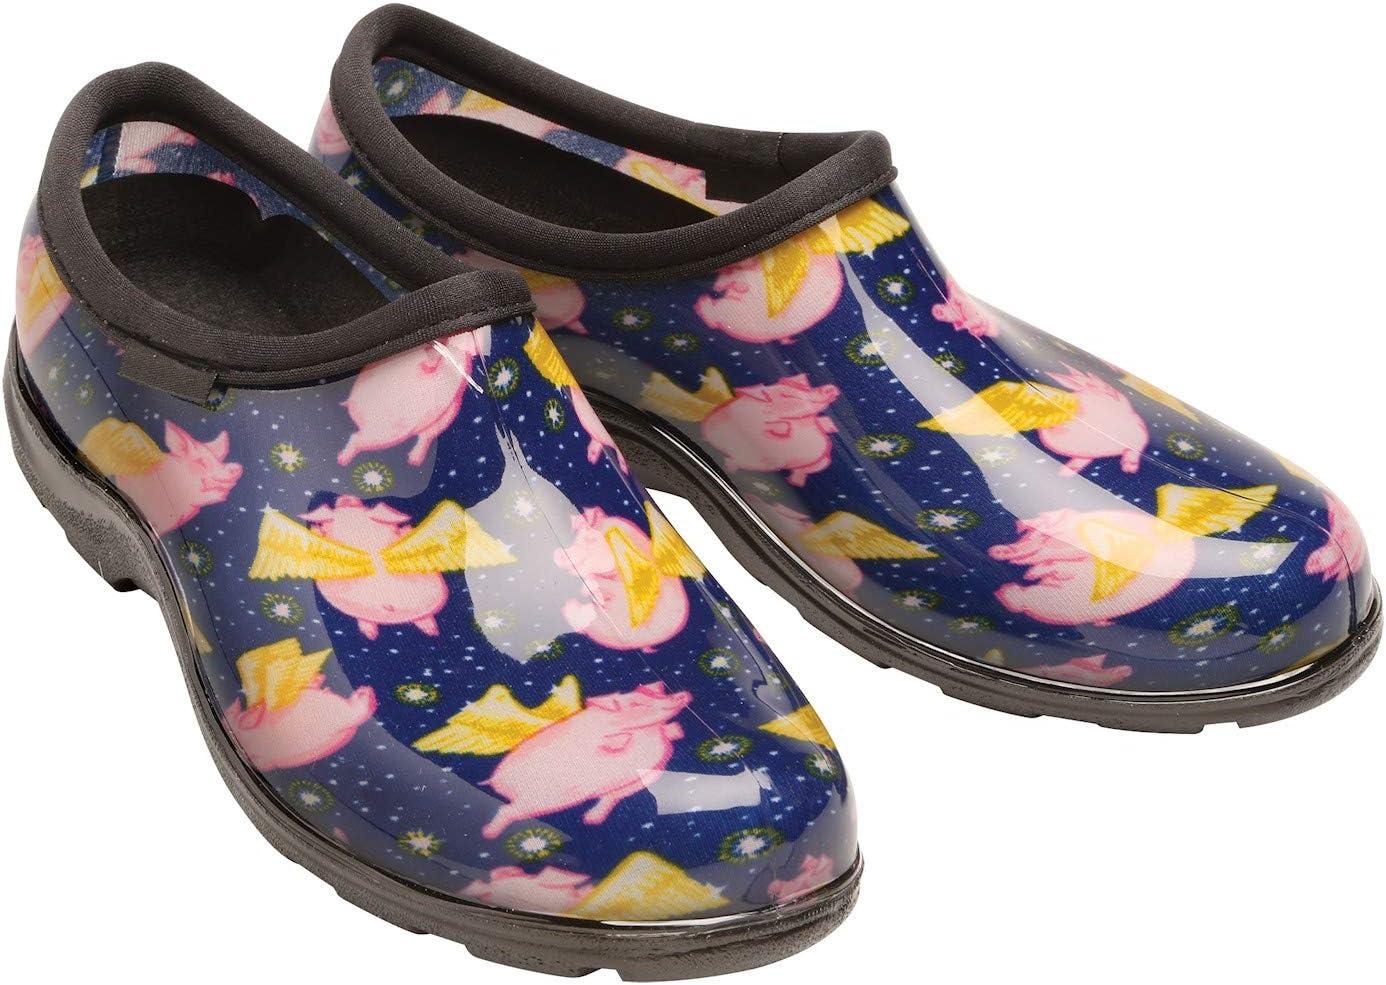 Sloggers Womens Waterproof Comfort Shoes